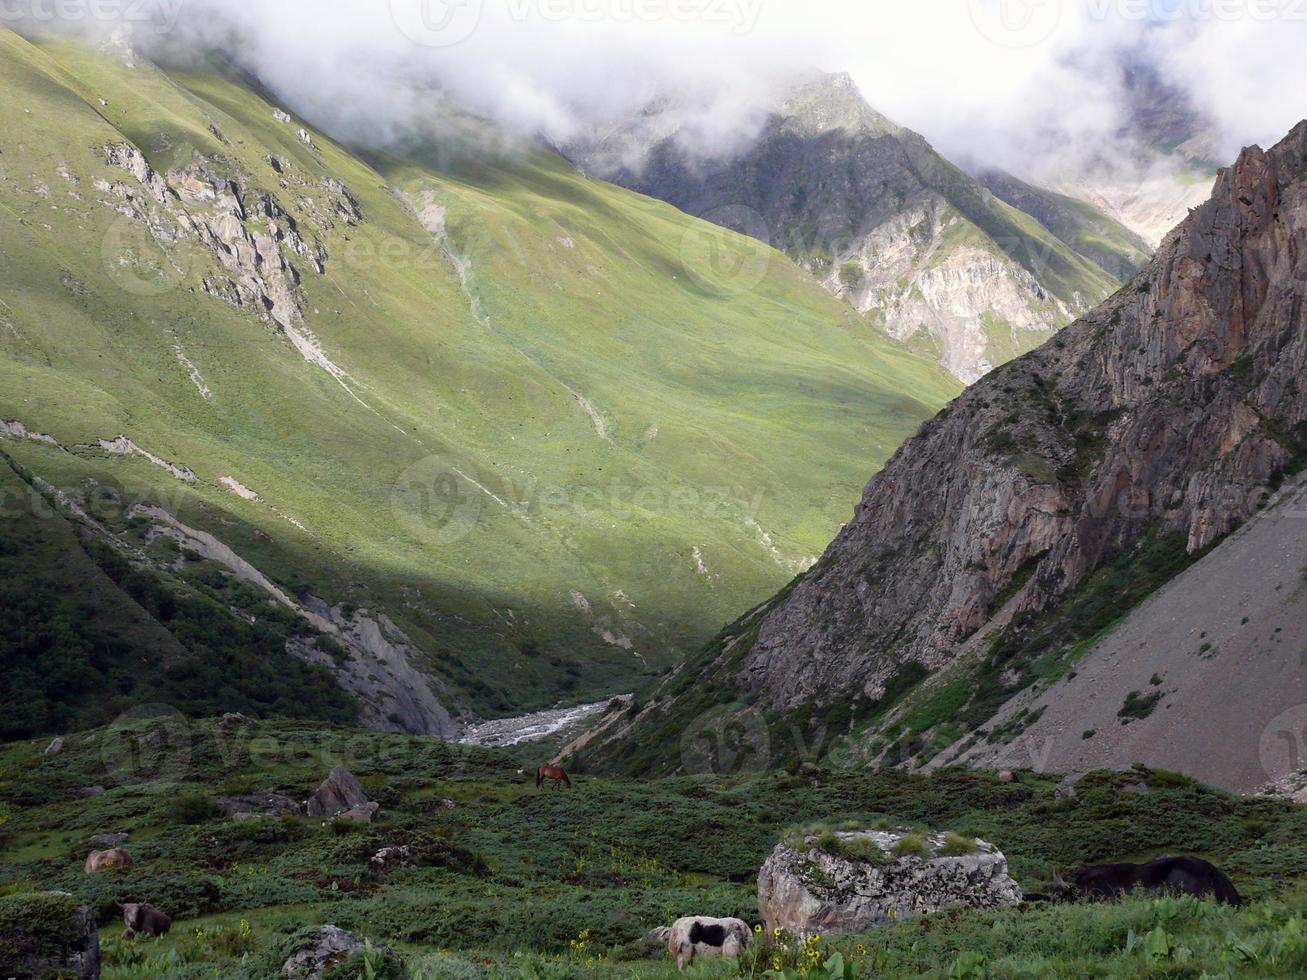 High Himalayan Landscape with Yaks photo